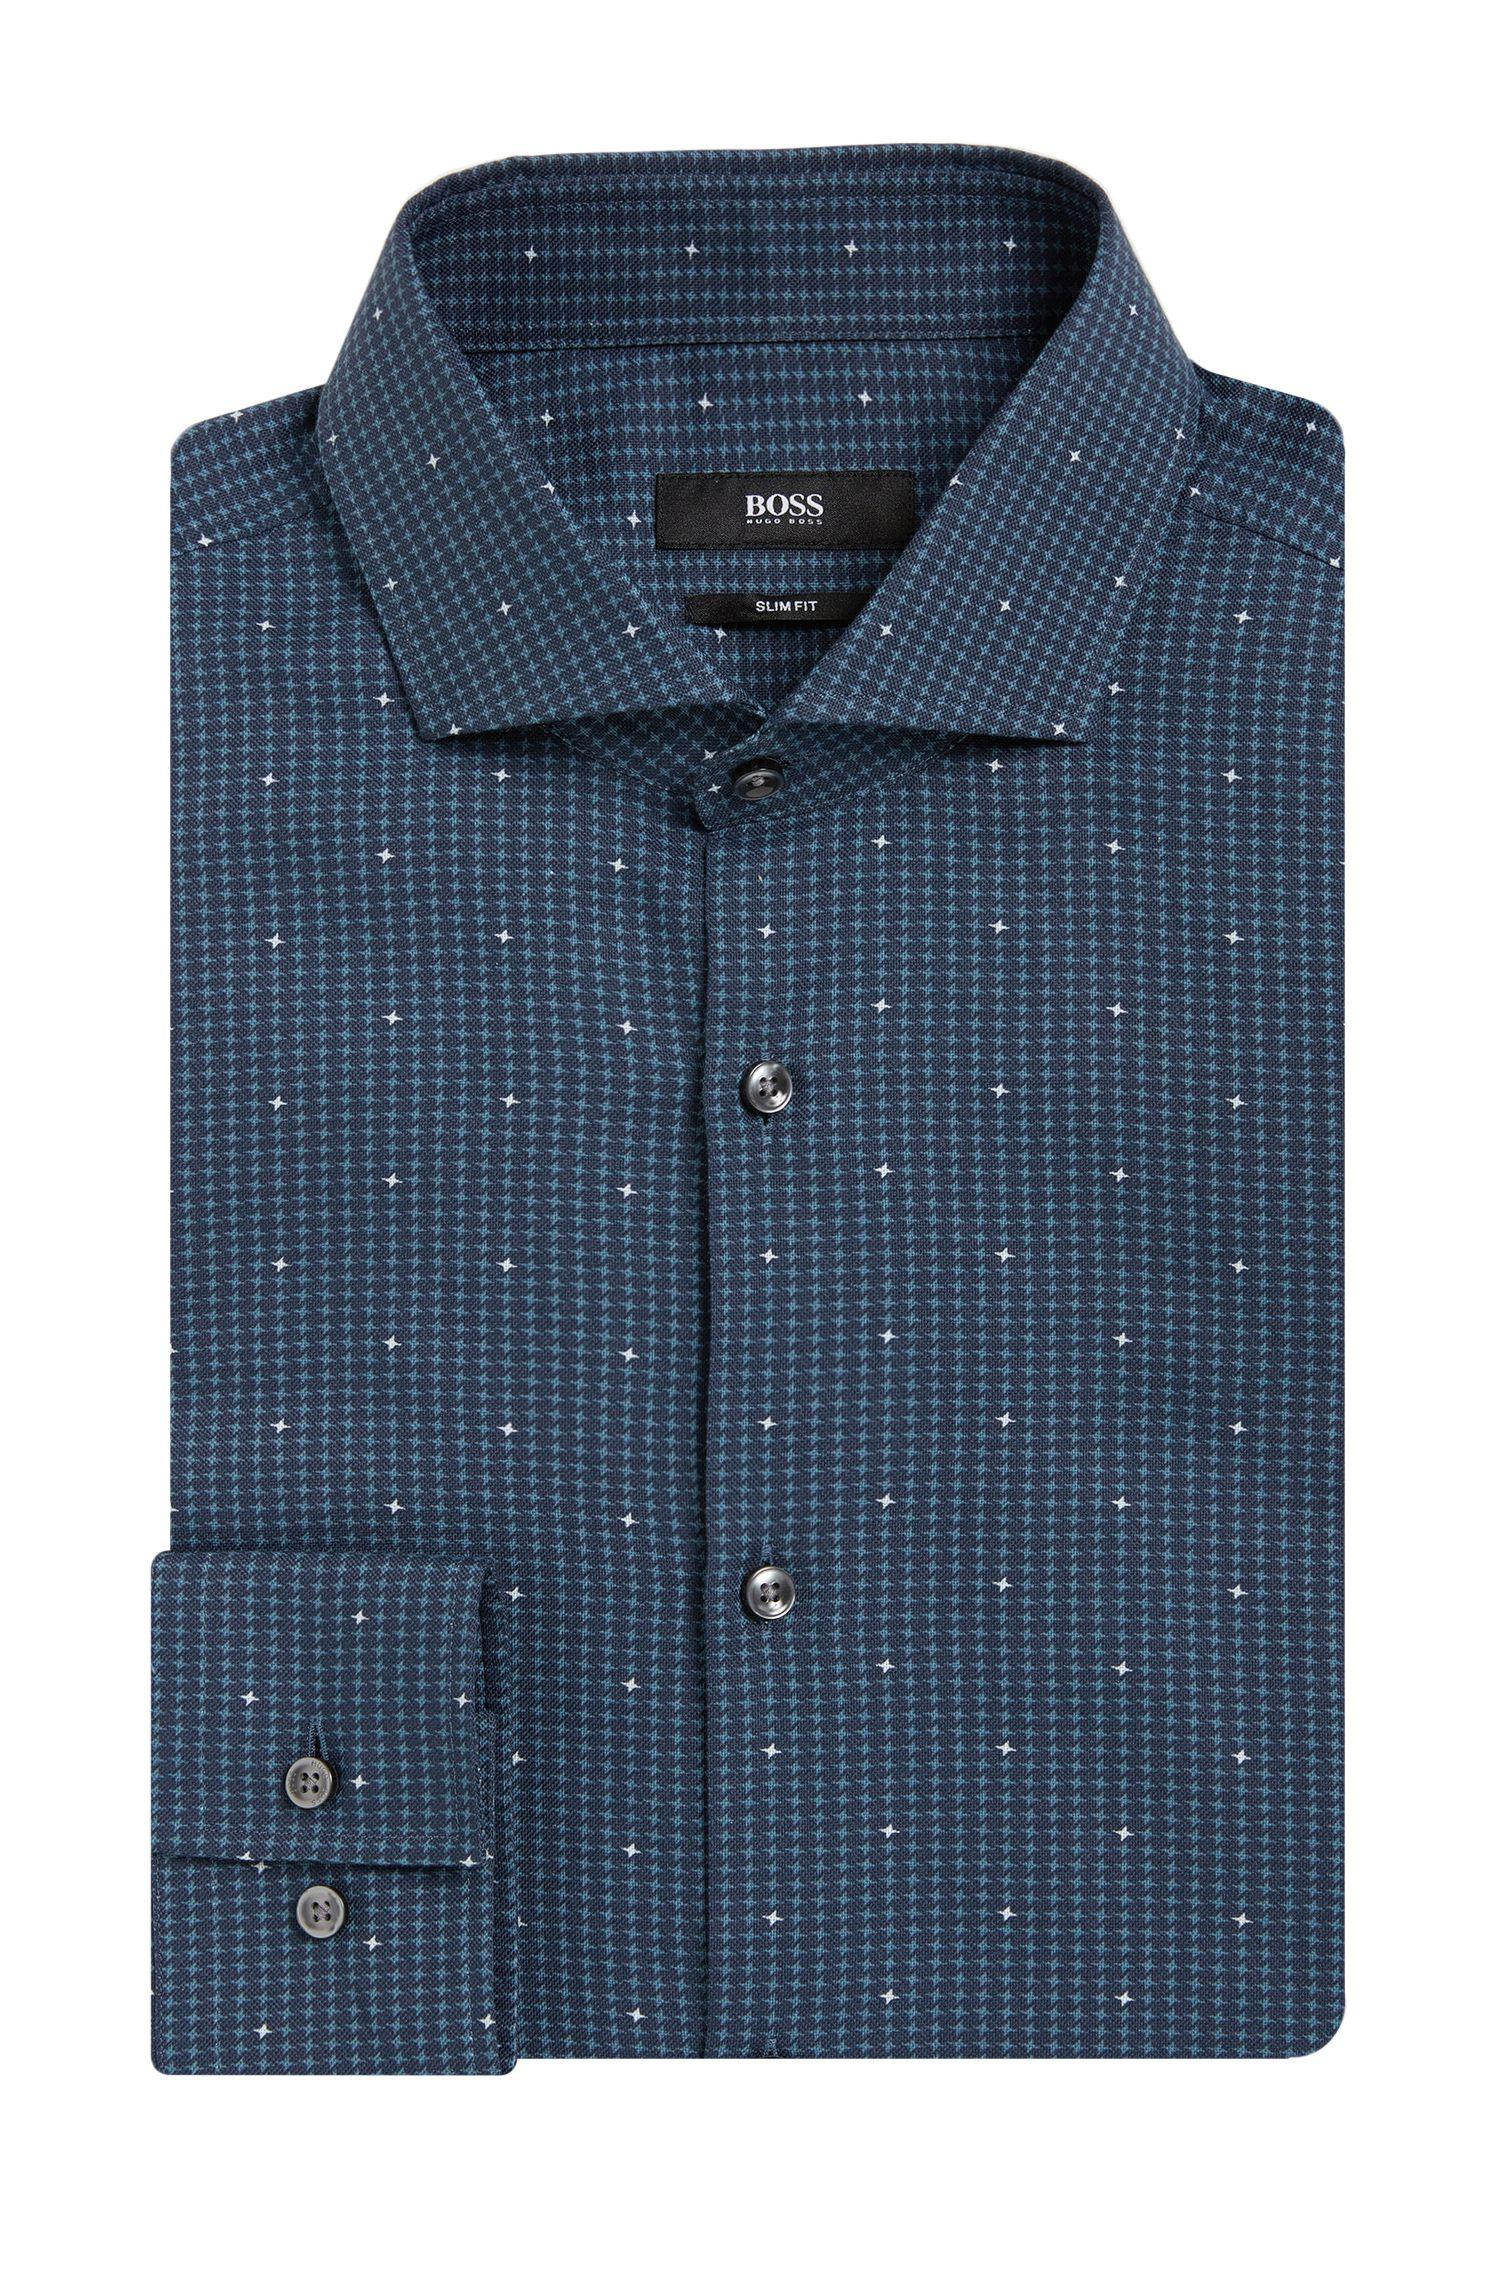 'Jason' | Slim Fit, Cotton Printed Dress Shirt